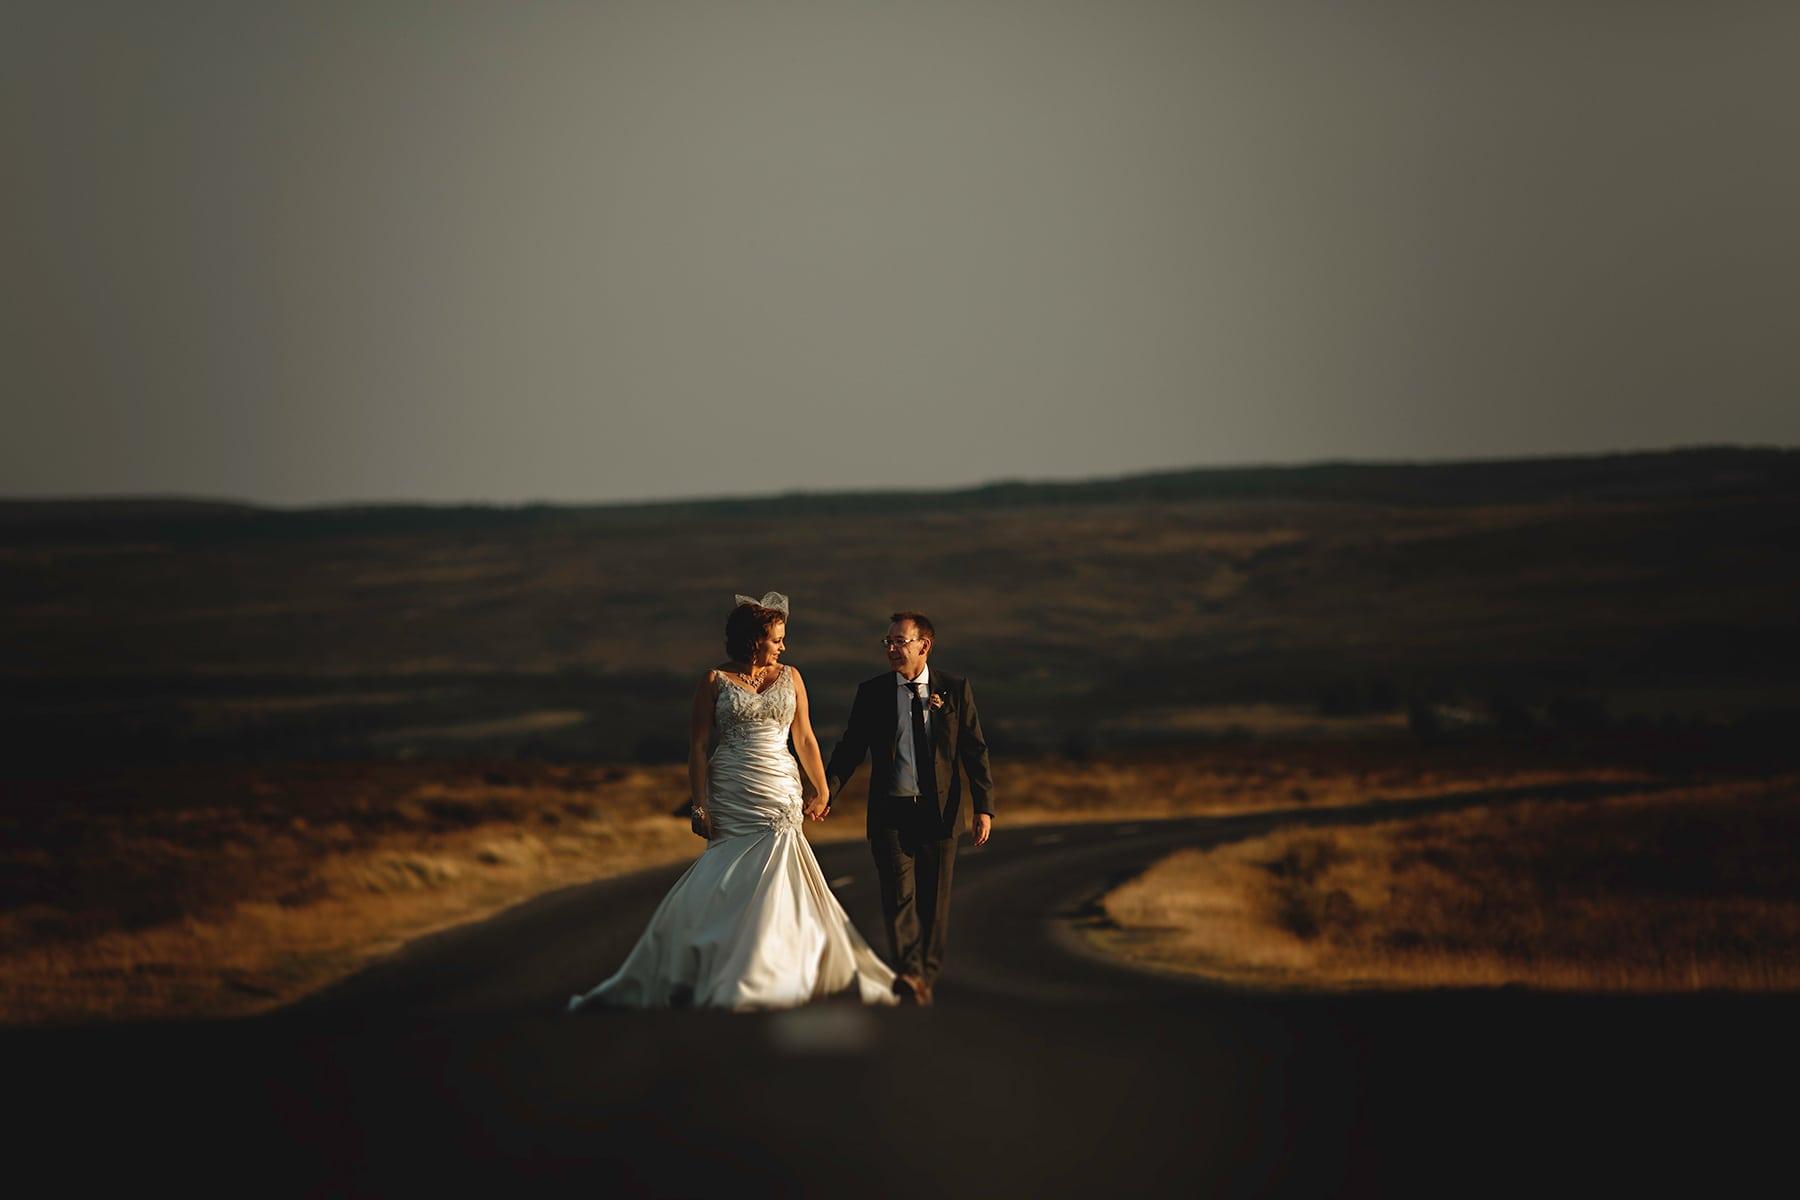 Mallyon_Spout_goathland_wedding_photos_yorkshire_whitby